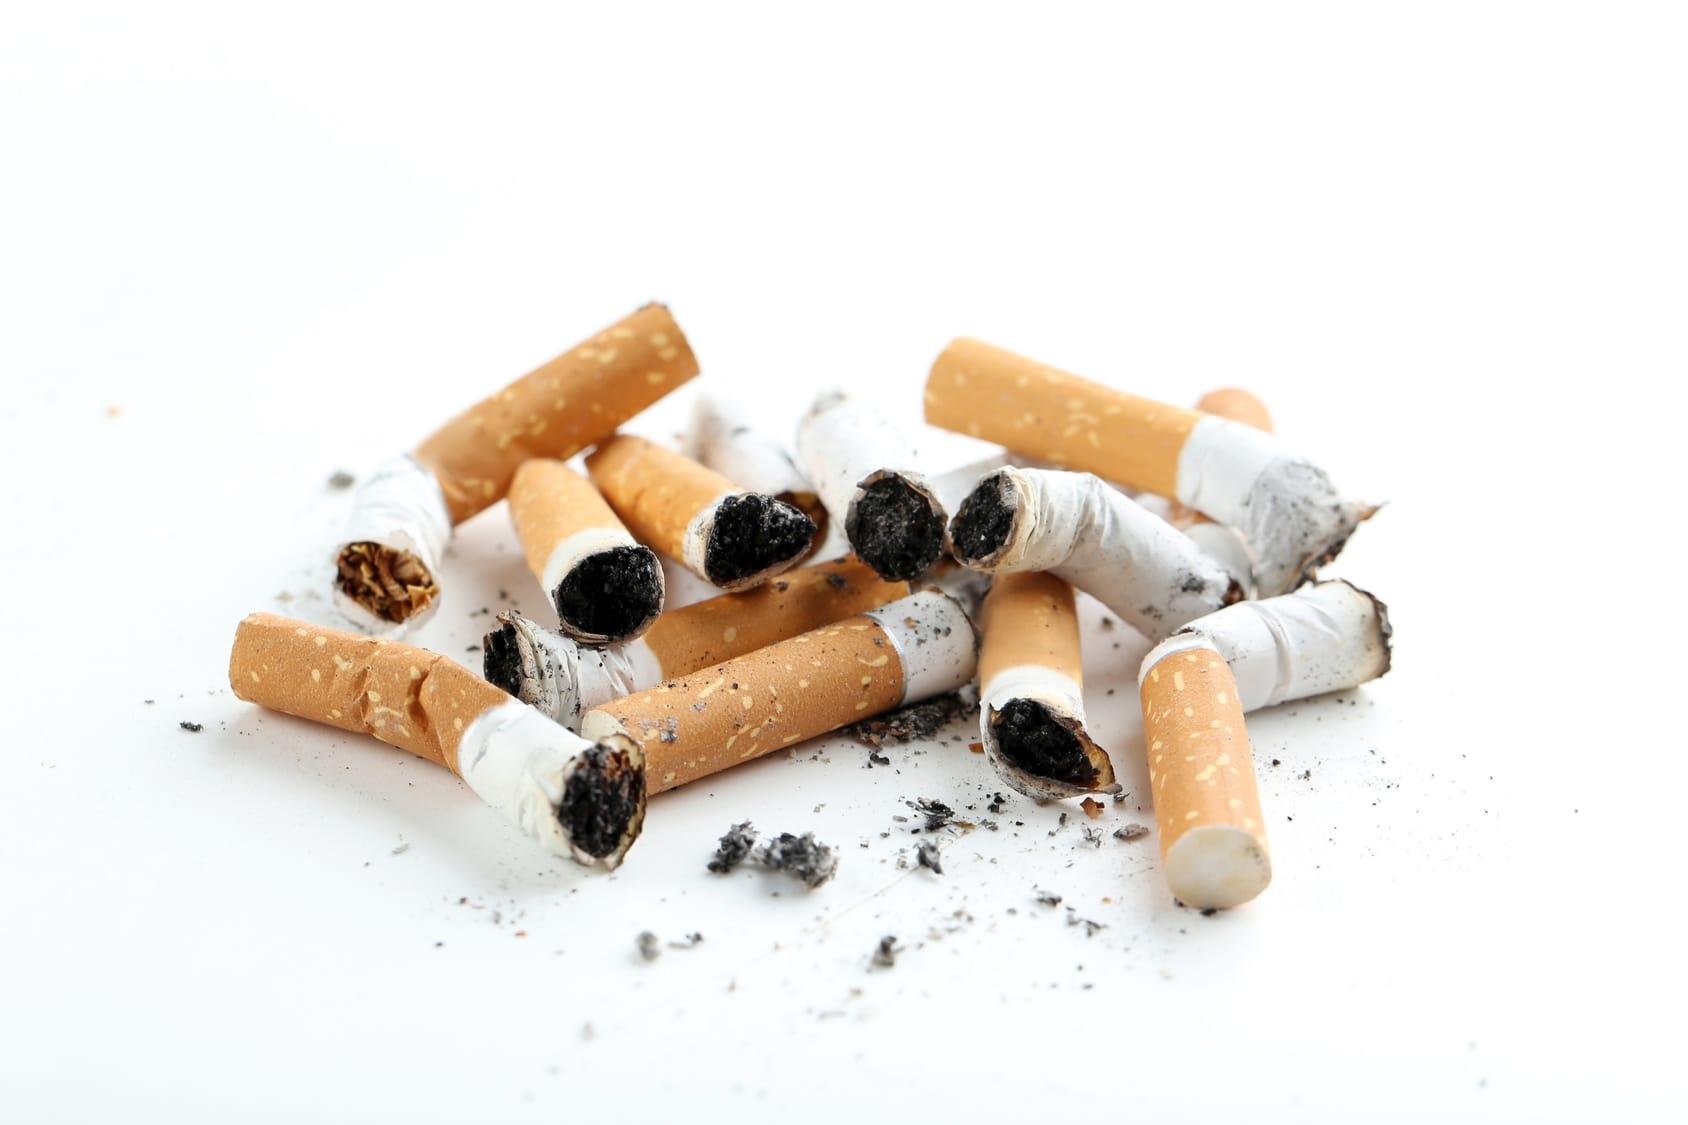 Tabakflecken entfernen – 7 Tipps & Tricks